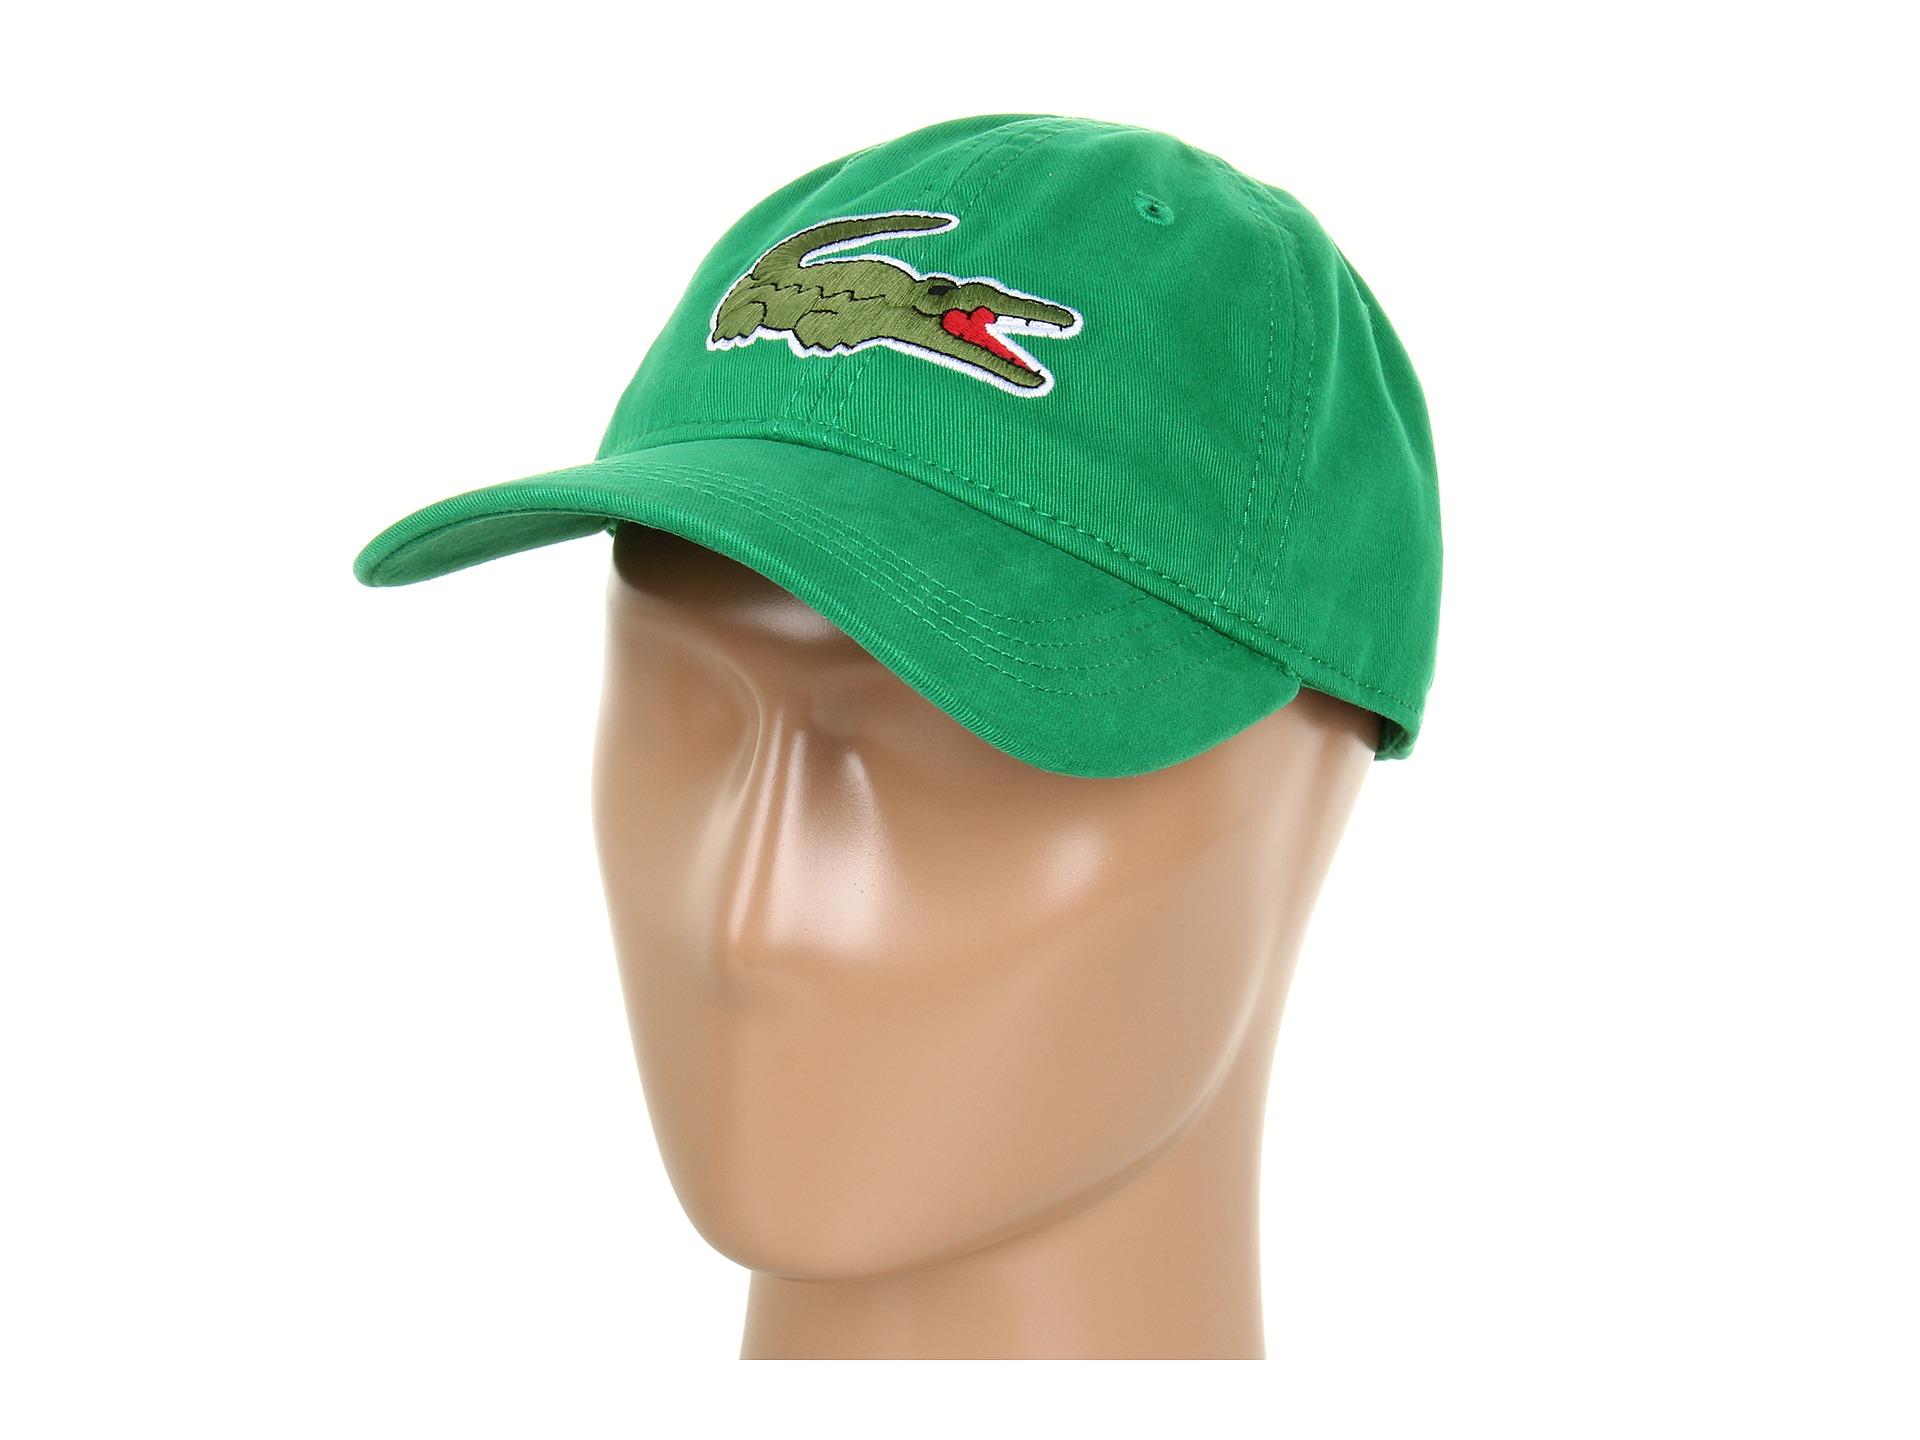 dde85f62c Lyst - Lacoste Large Croc Gabardine Cap in Green for Men